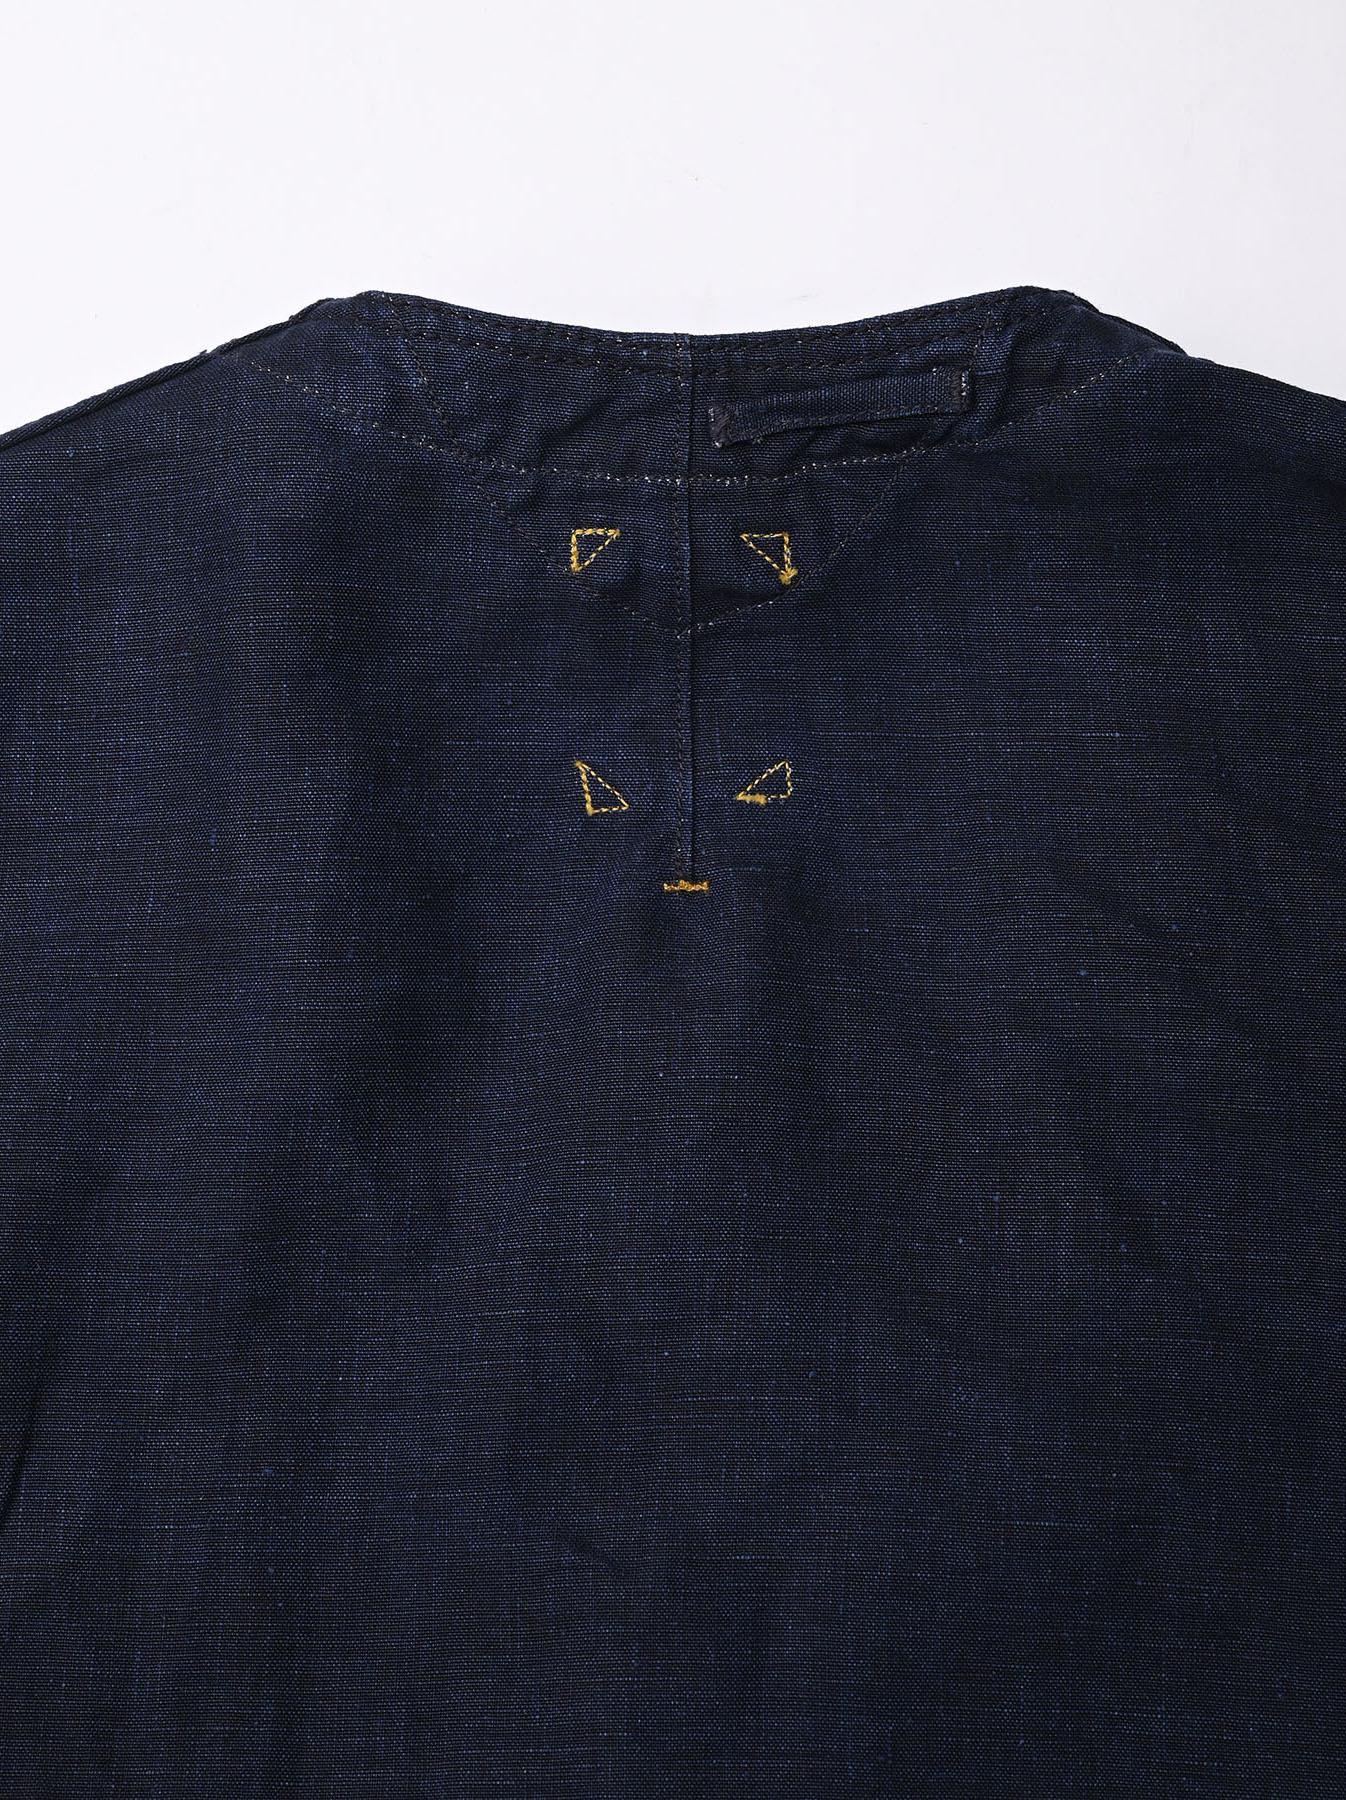 Indigo Linen 908 V-neck Coverall (0421)-7